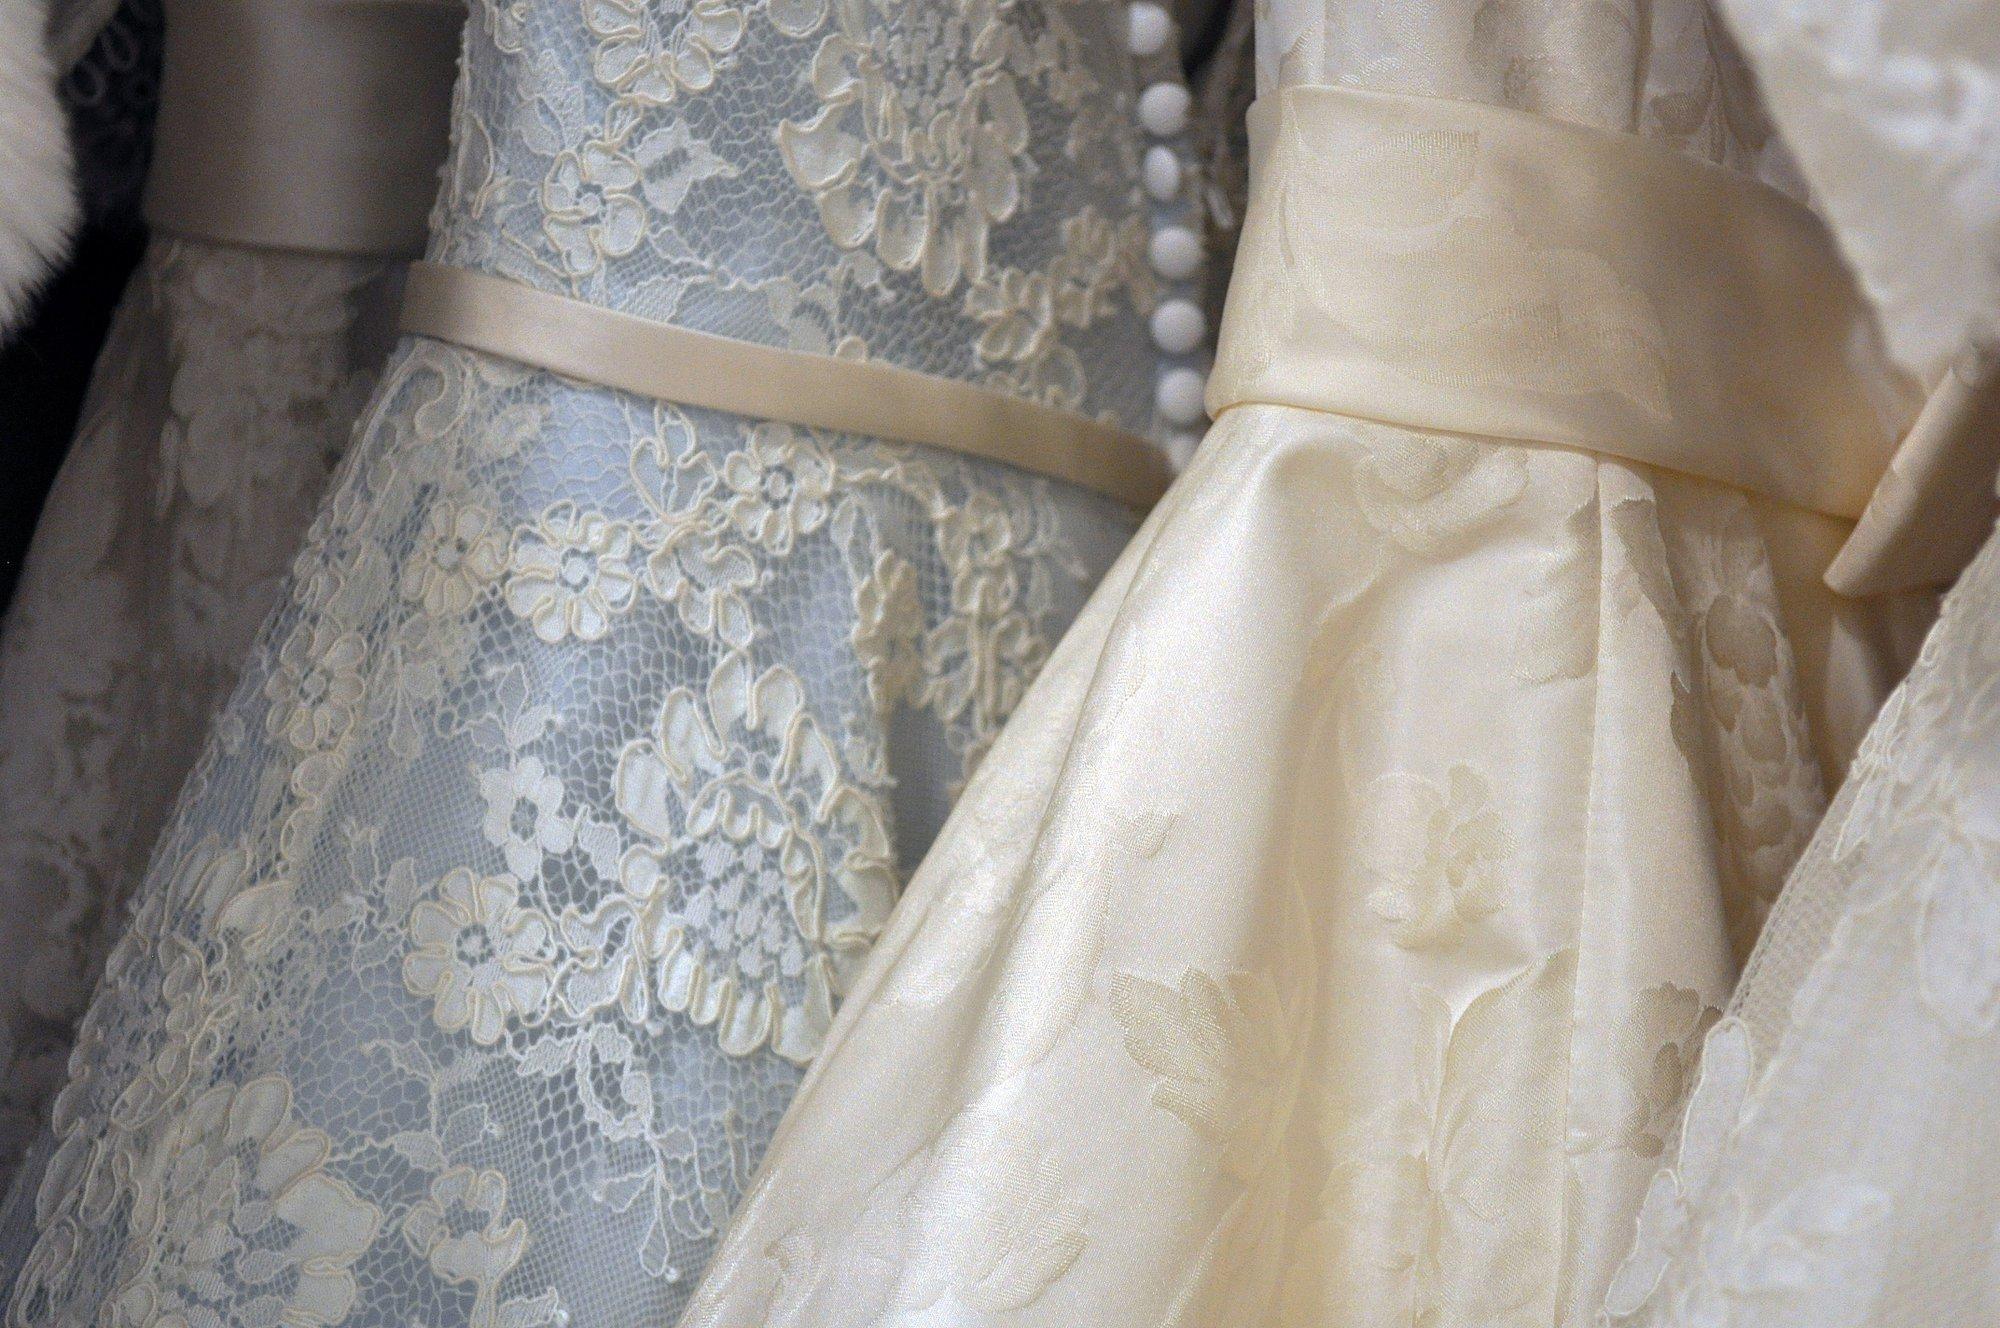 Vintage Wedding Dress Styles for 2021